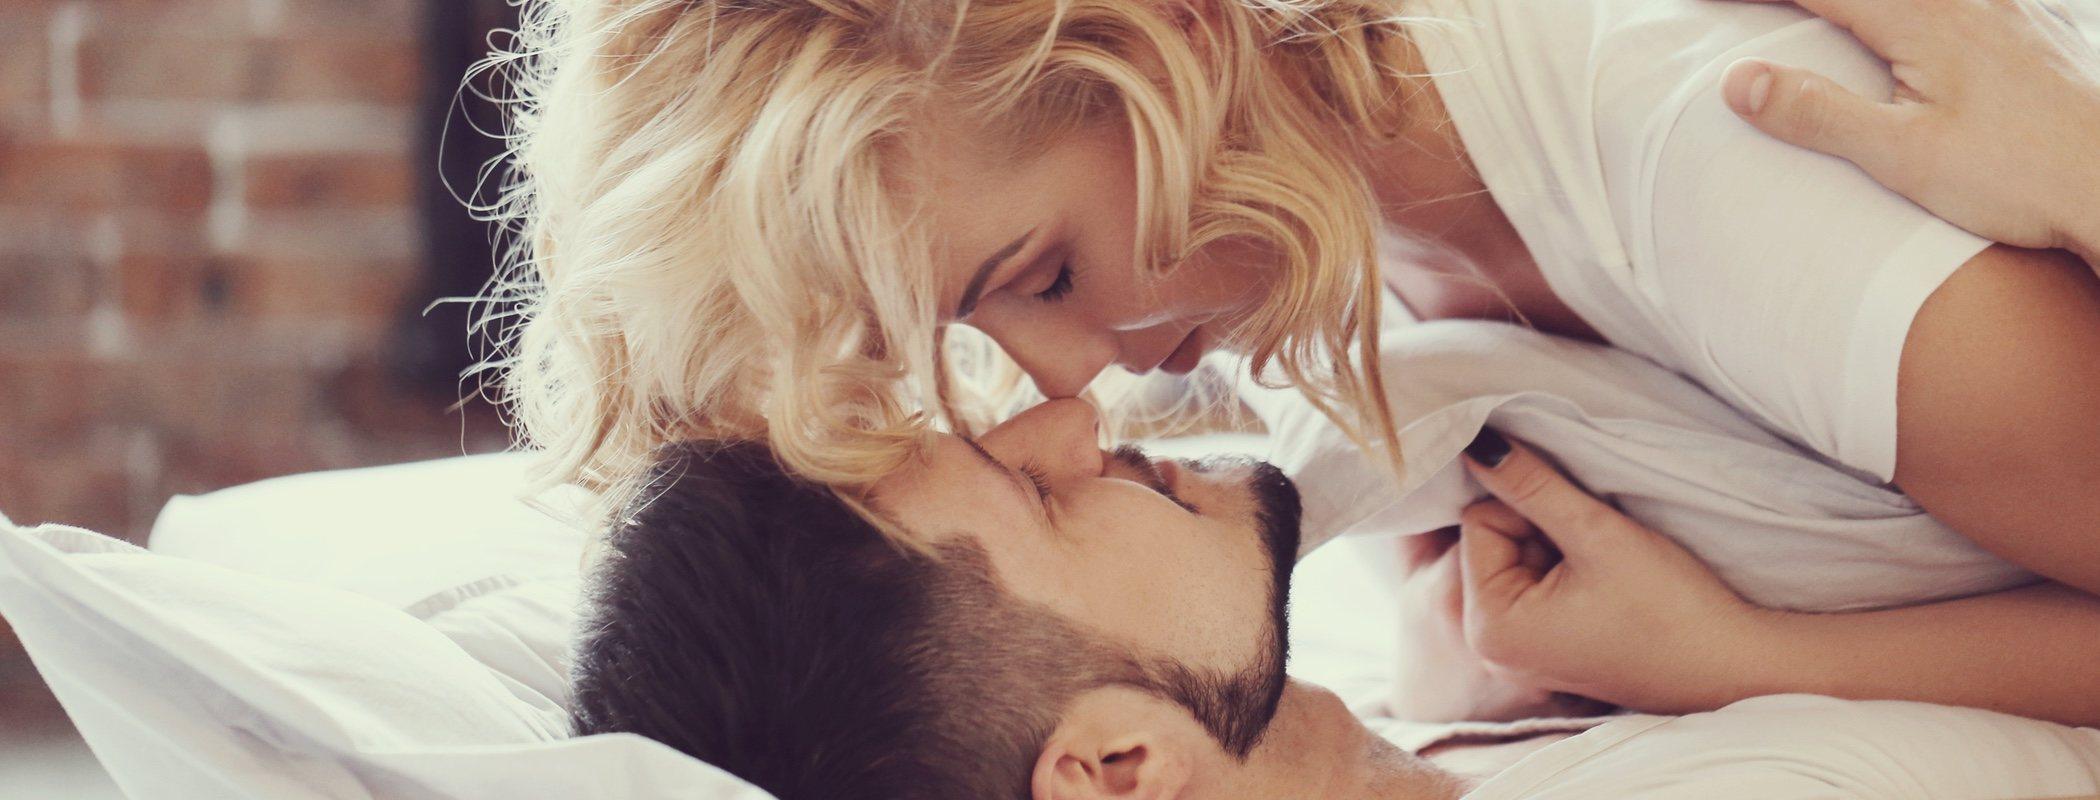 Sexo en la primera cita: ¿a favor o en contra?